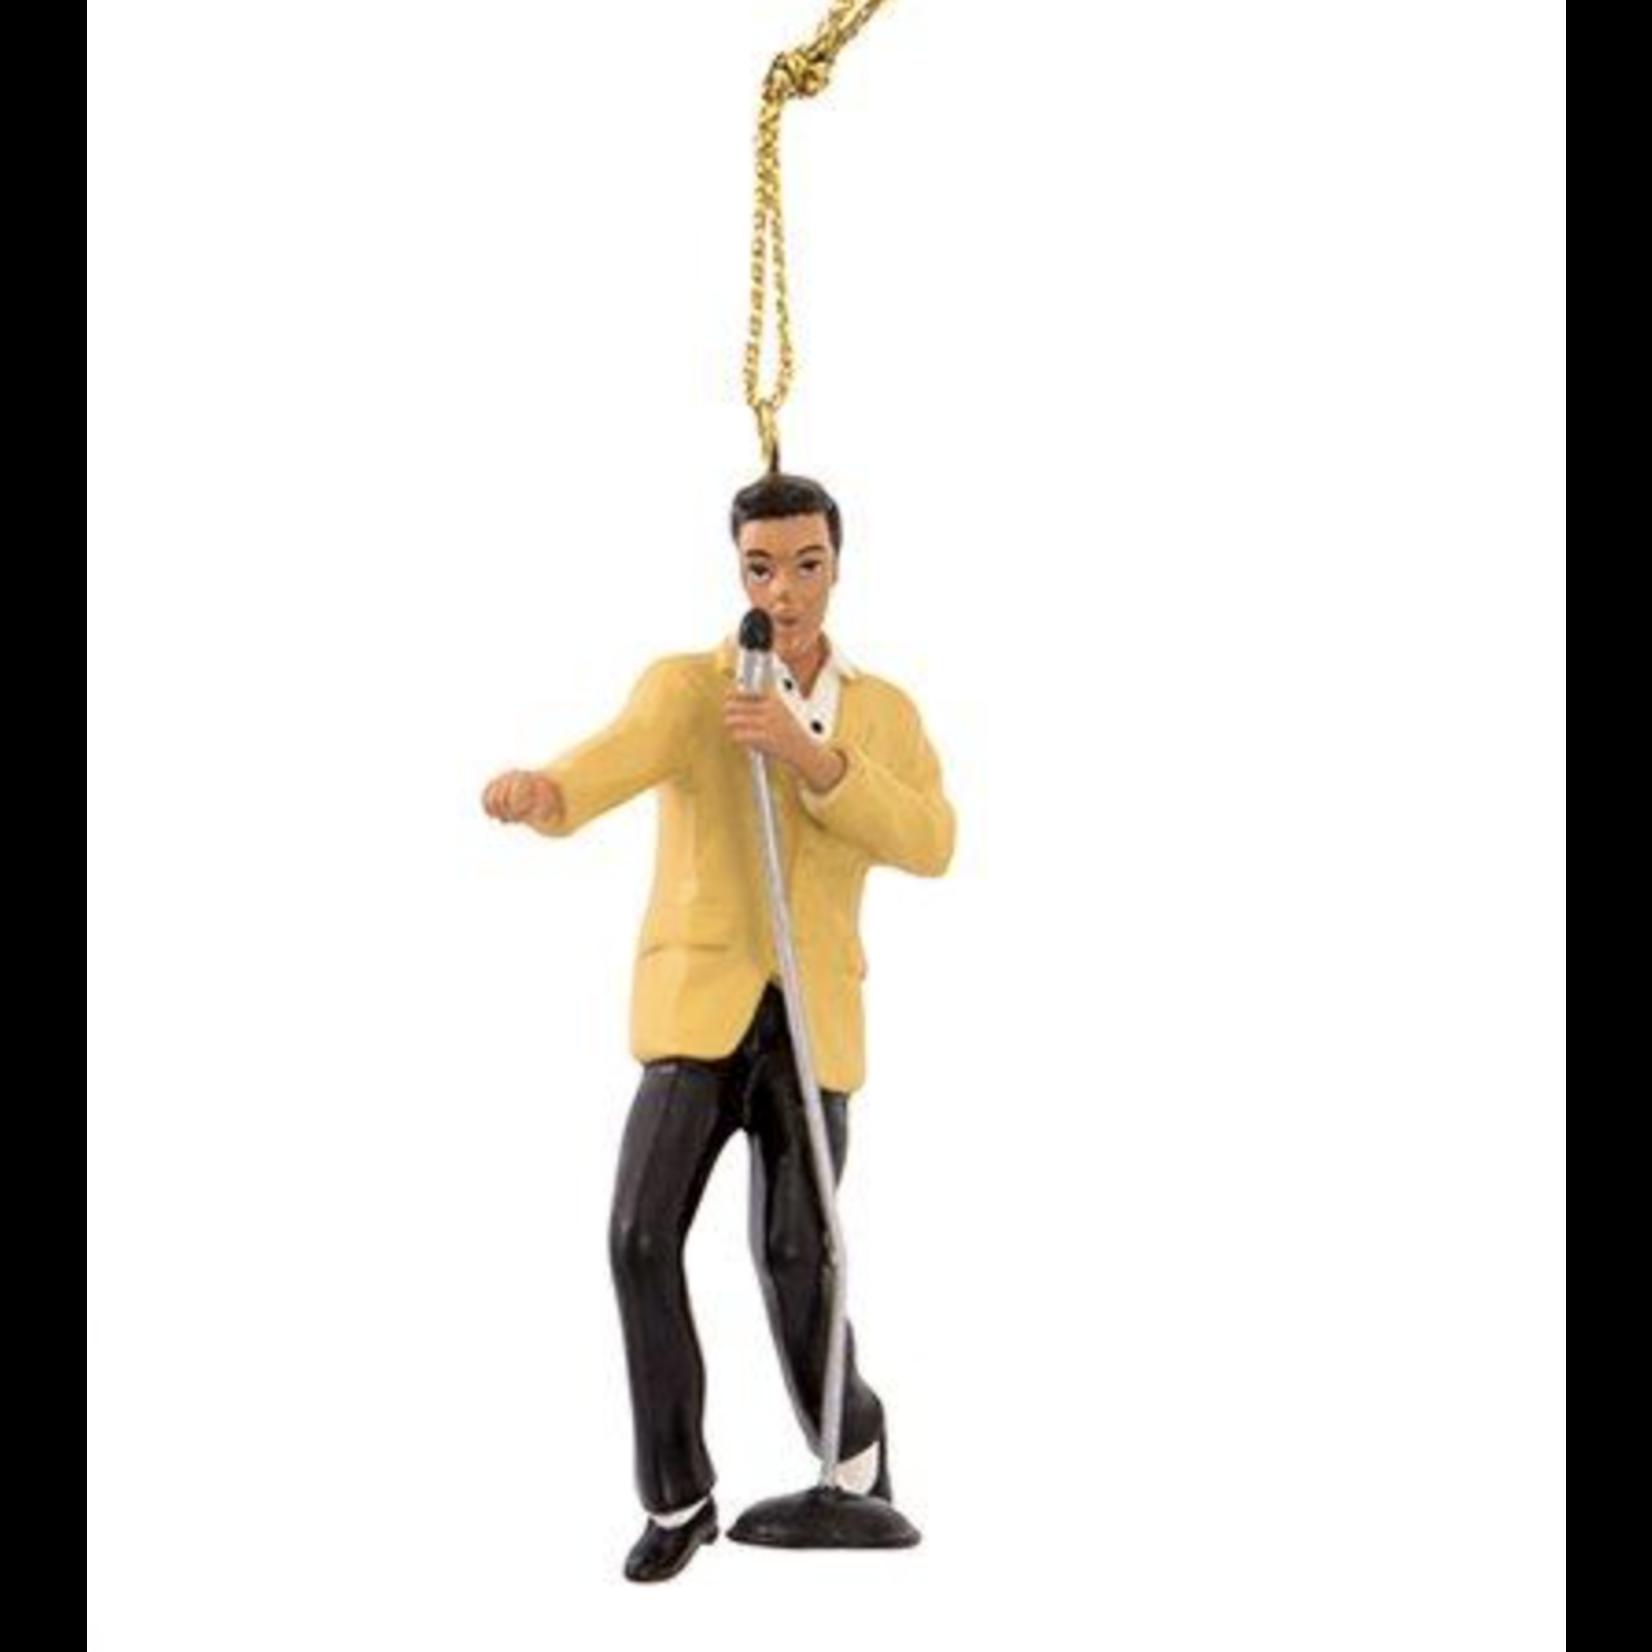 Ornament - Elvis - 2.5 inch Yellow Jacket